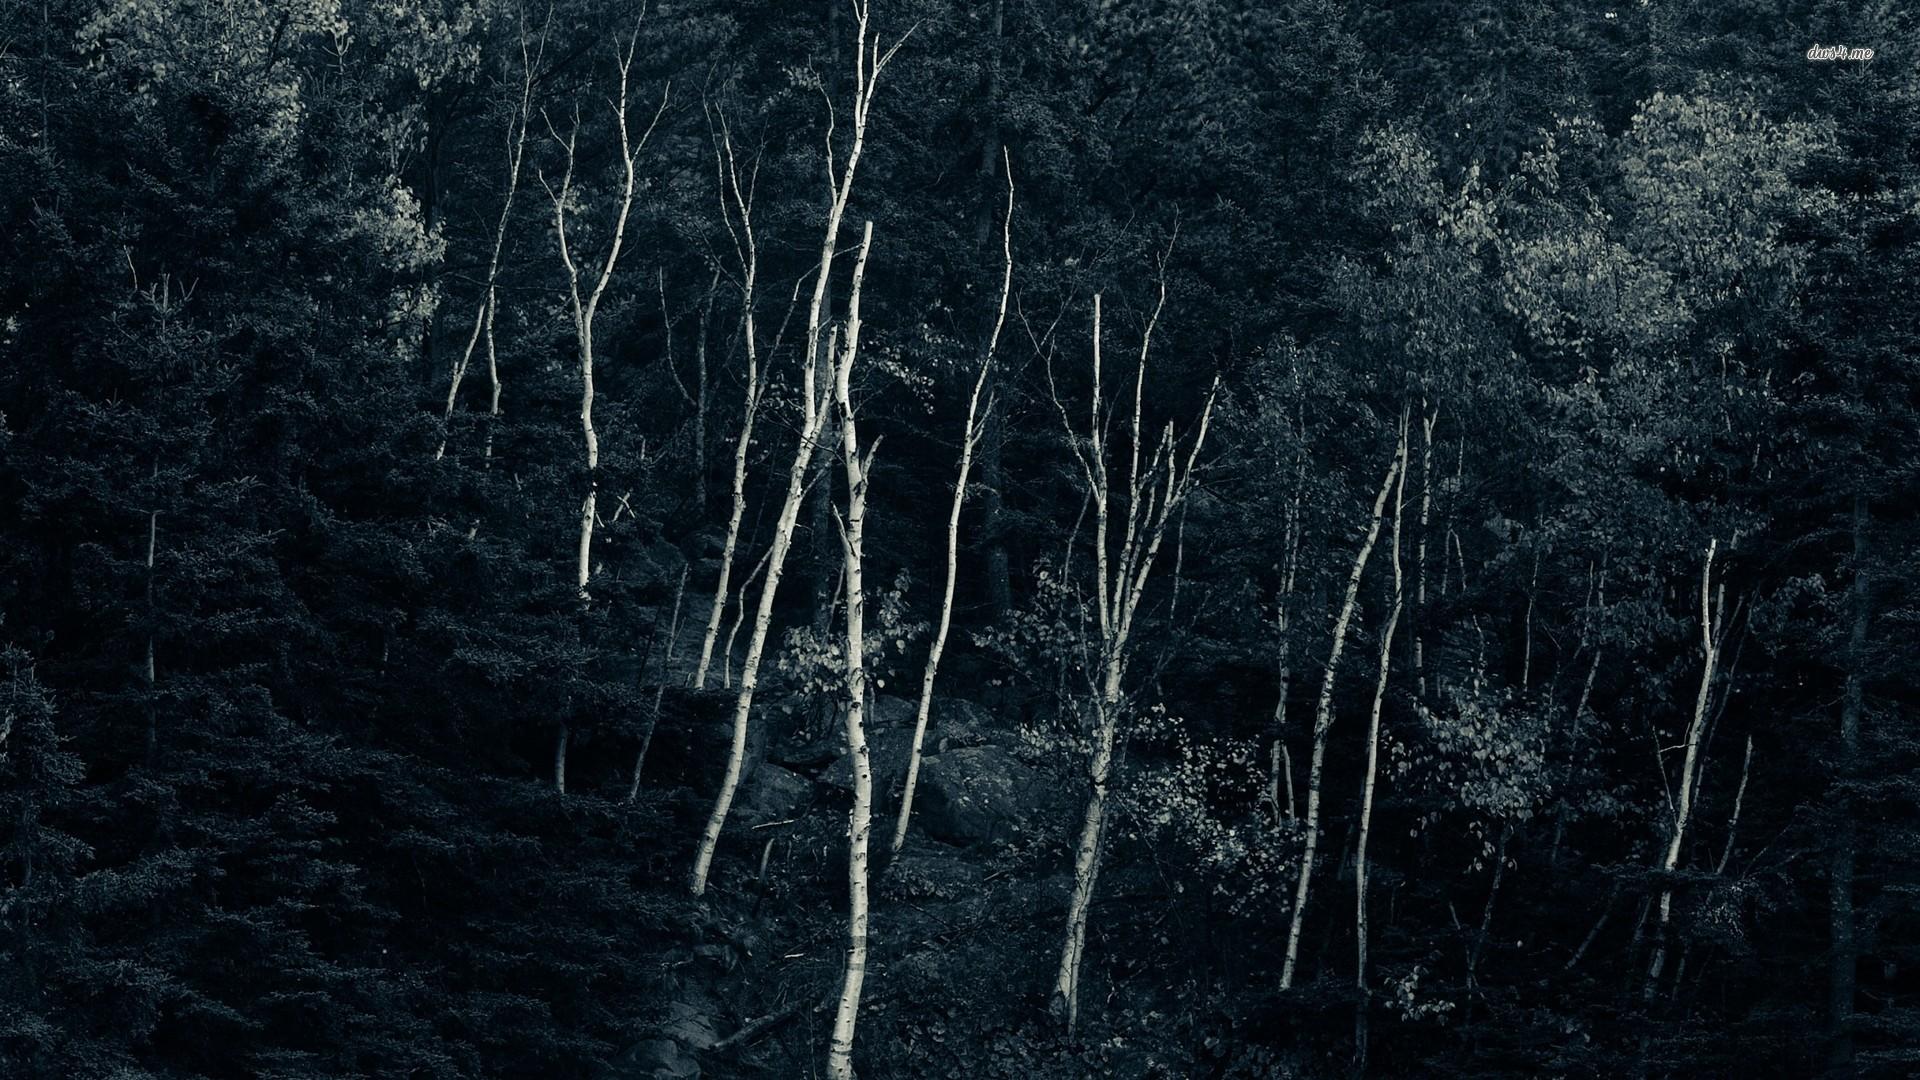 3d Snowy Cottage Animated Wallpaper Free Download Hd Dark Woods Backgrounds Pixelstalk Net